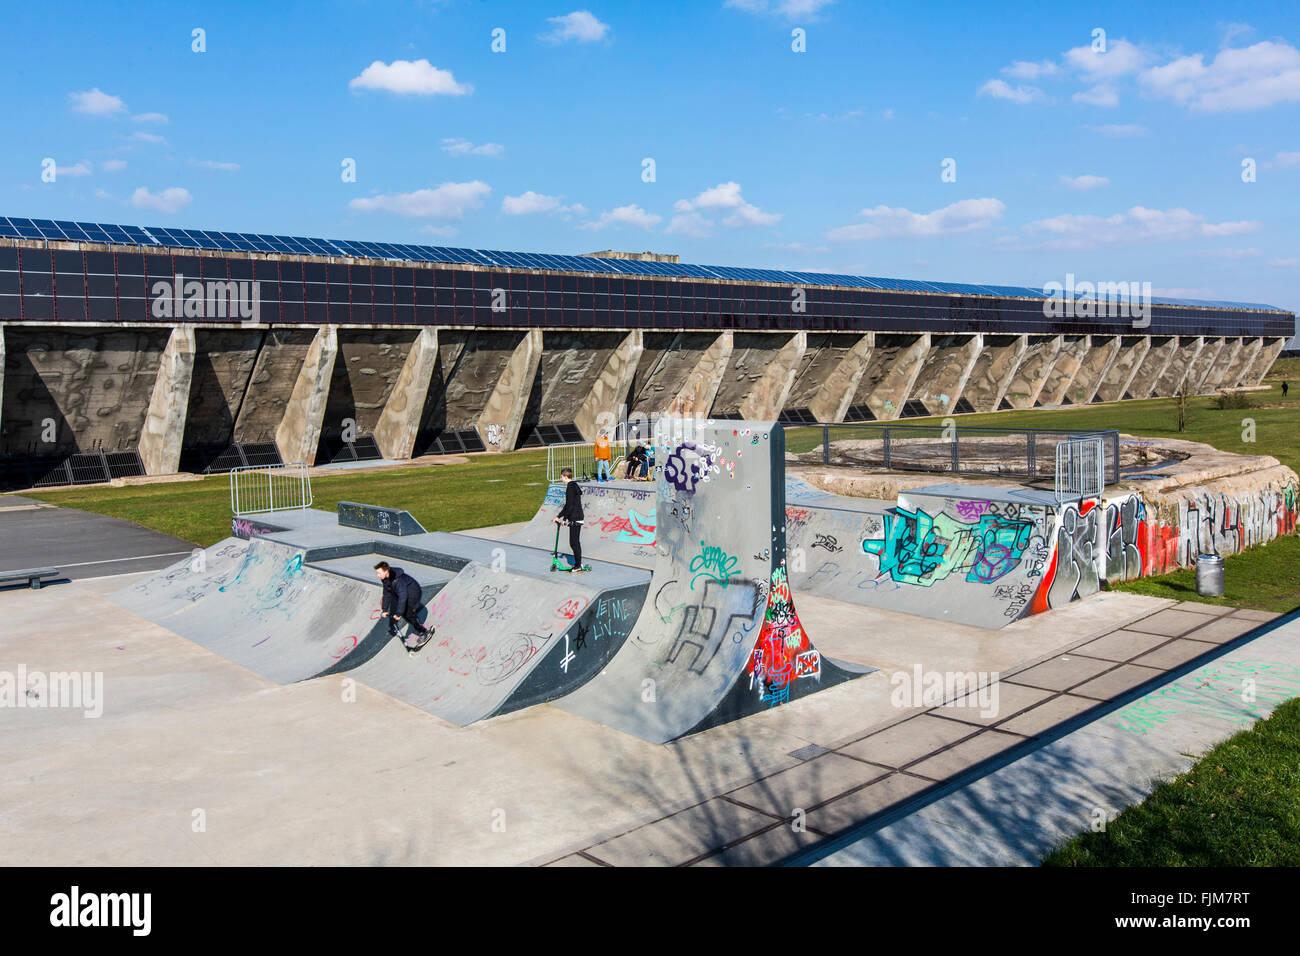 Schalker Verein, a former steelworks in Gelsenkirchen, Germany, Solar power plant on the old ore bunkers, skater - Stock Image